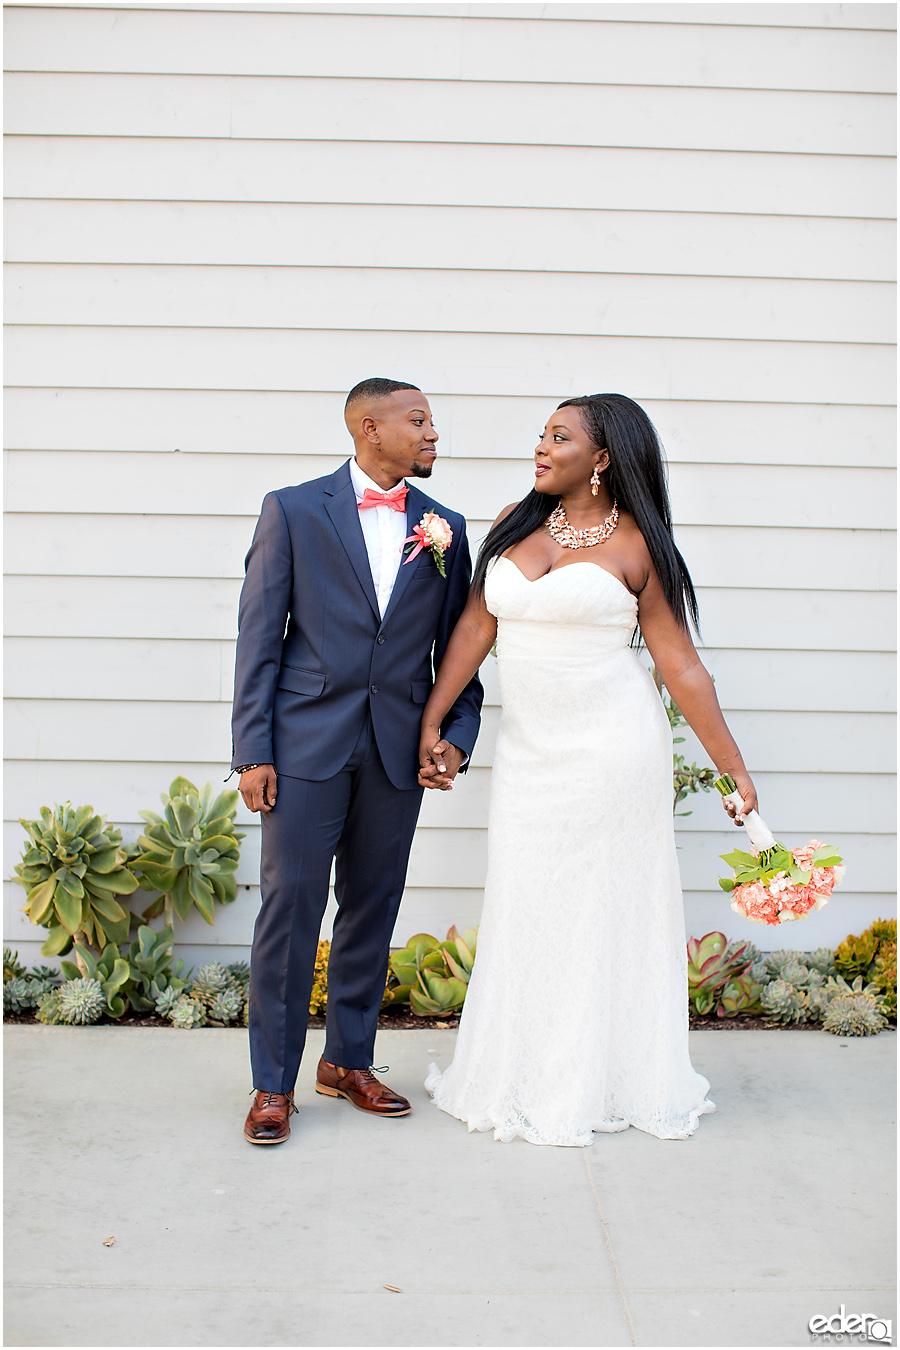 Bride and groom wedding portrait in Imperial Beach.